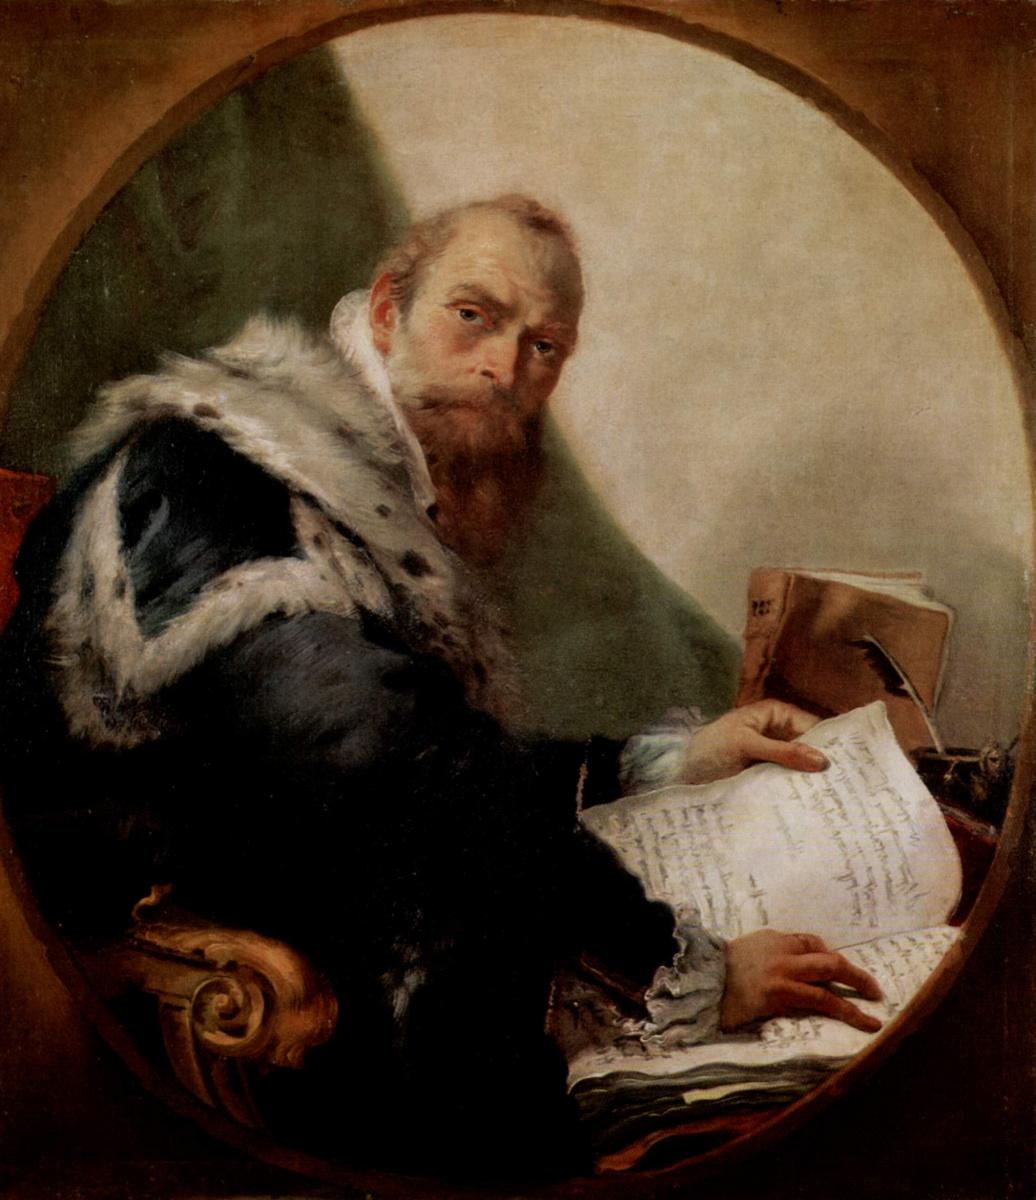 Portrait of Antonio Riccobono